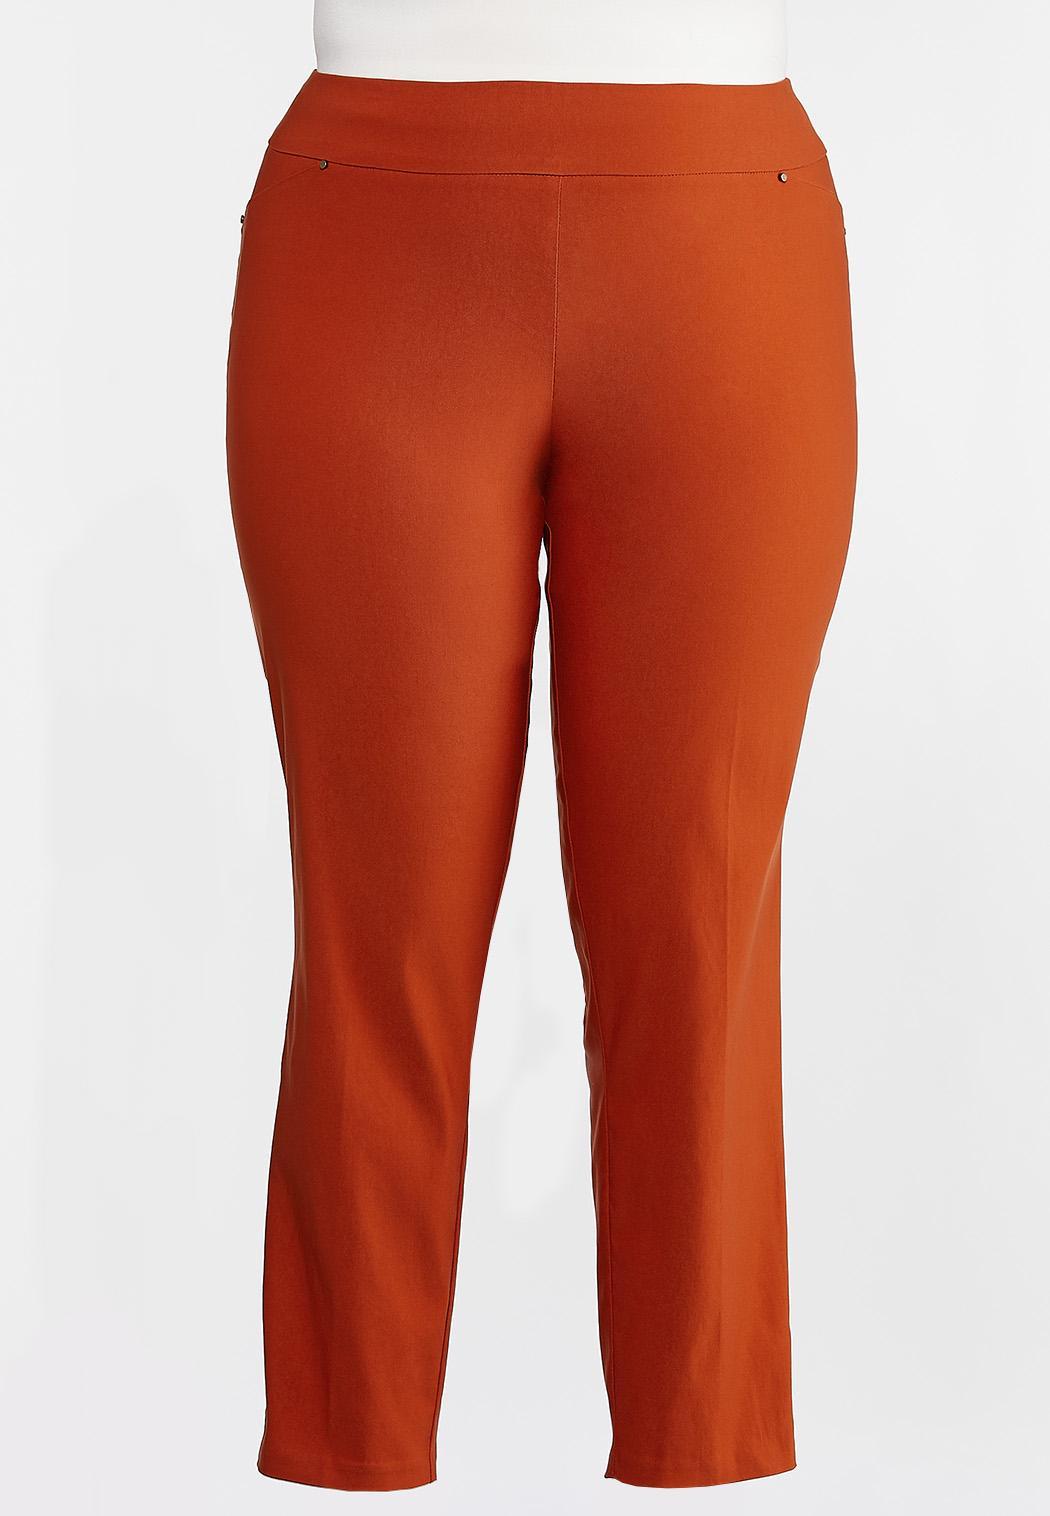 Cato Woman Bengaline Pants